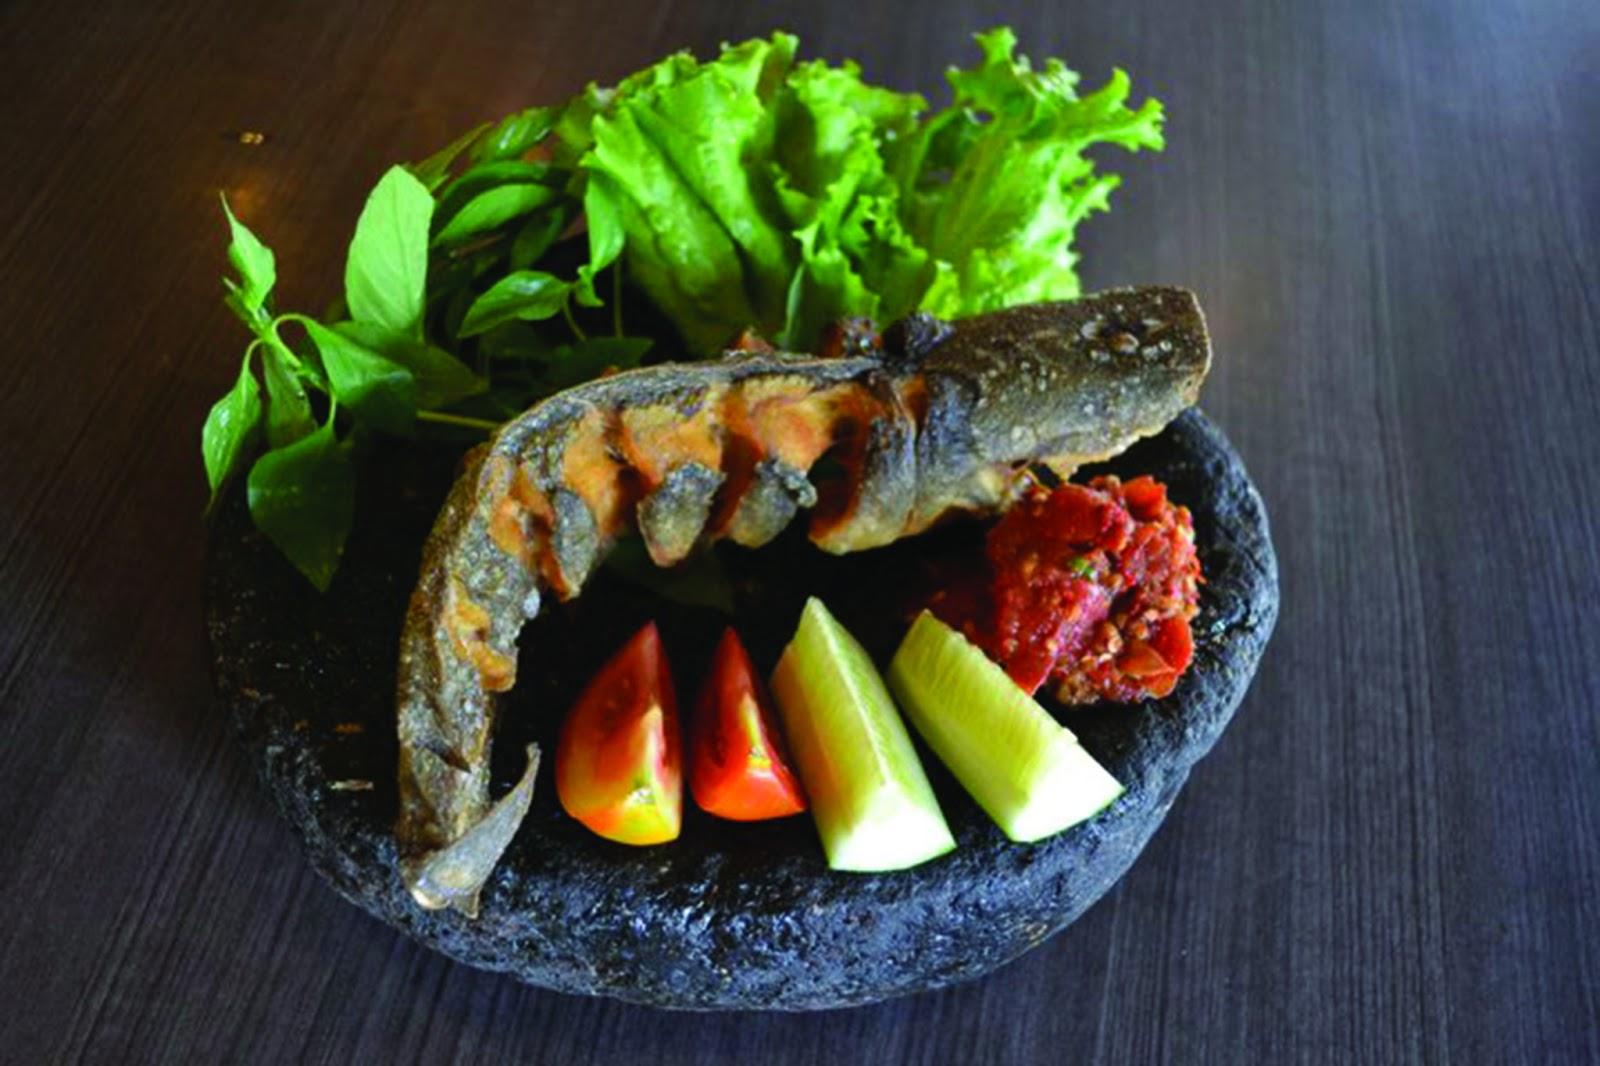 lalapan cucina indonesiana